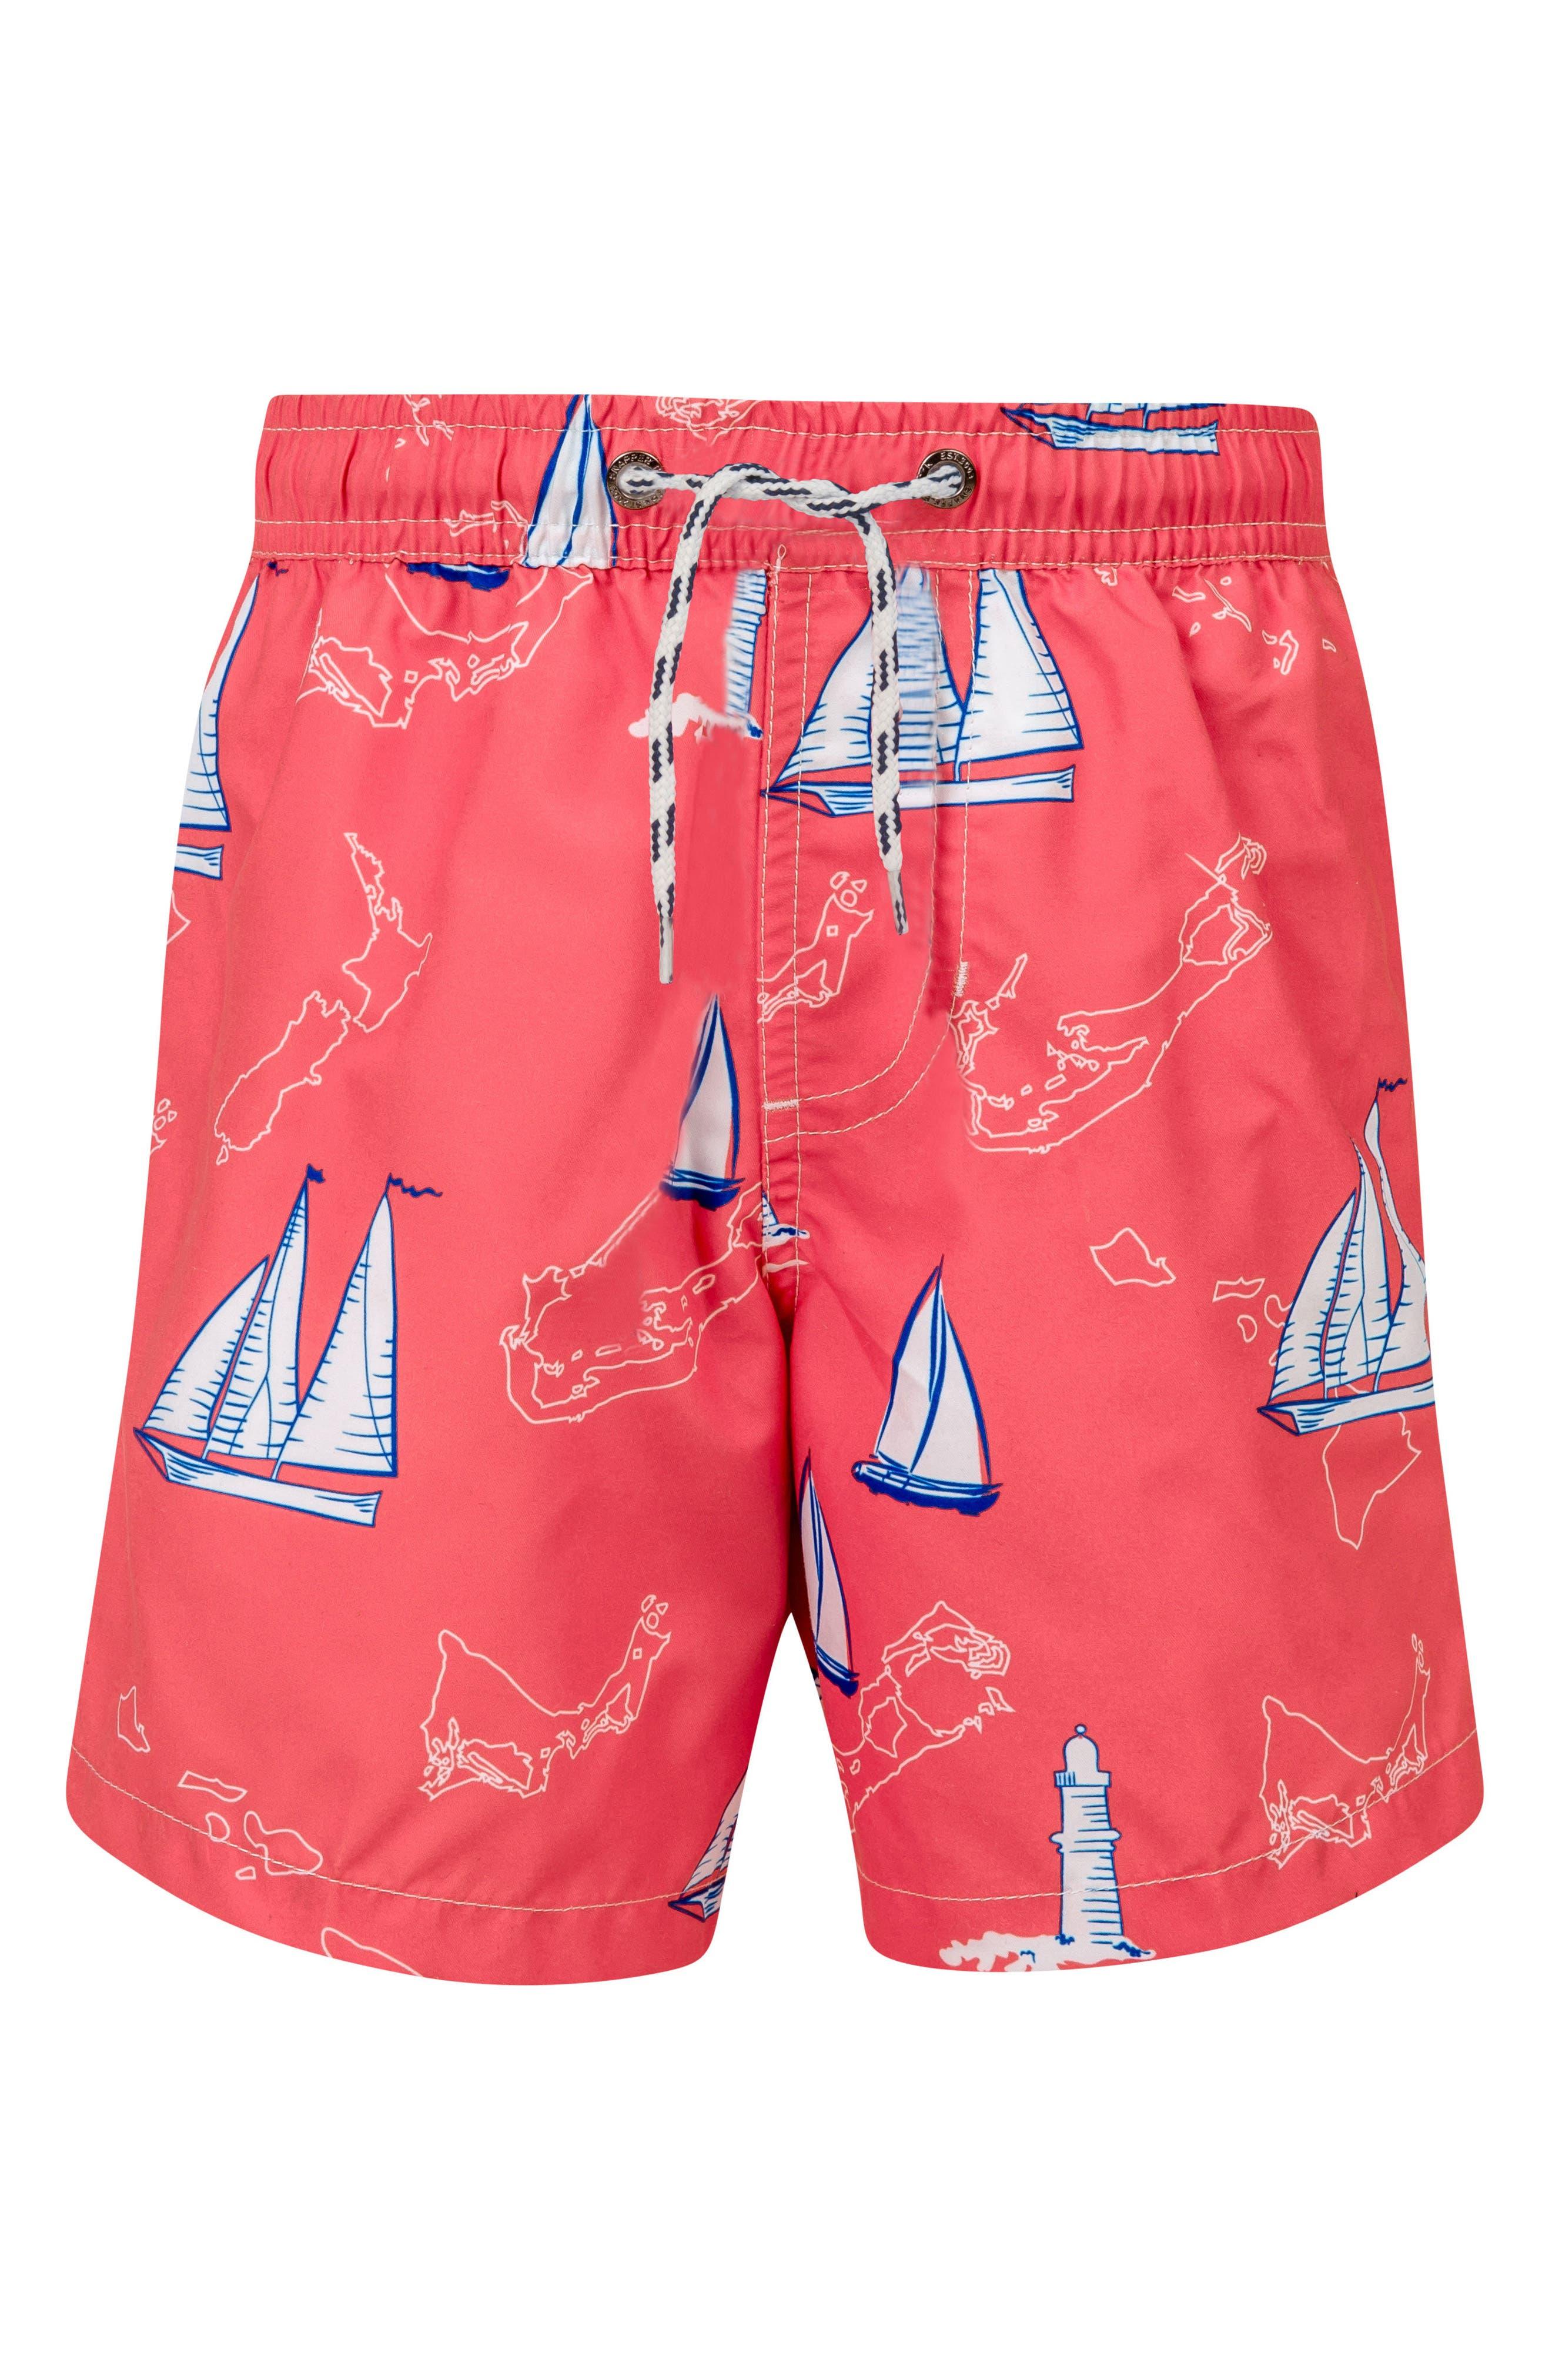 Island Sail Board Shorts,                         Main,                         color, Red Multi